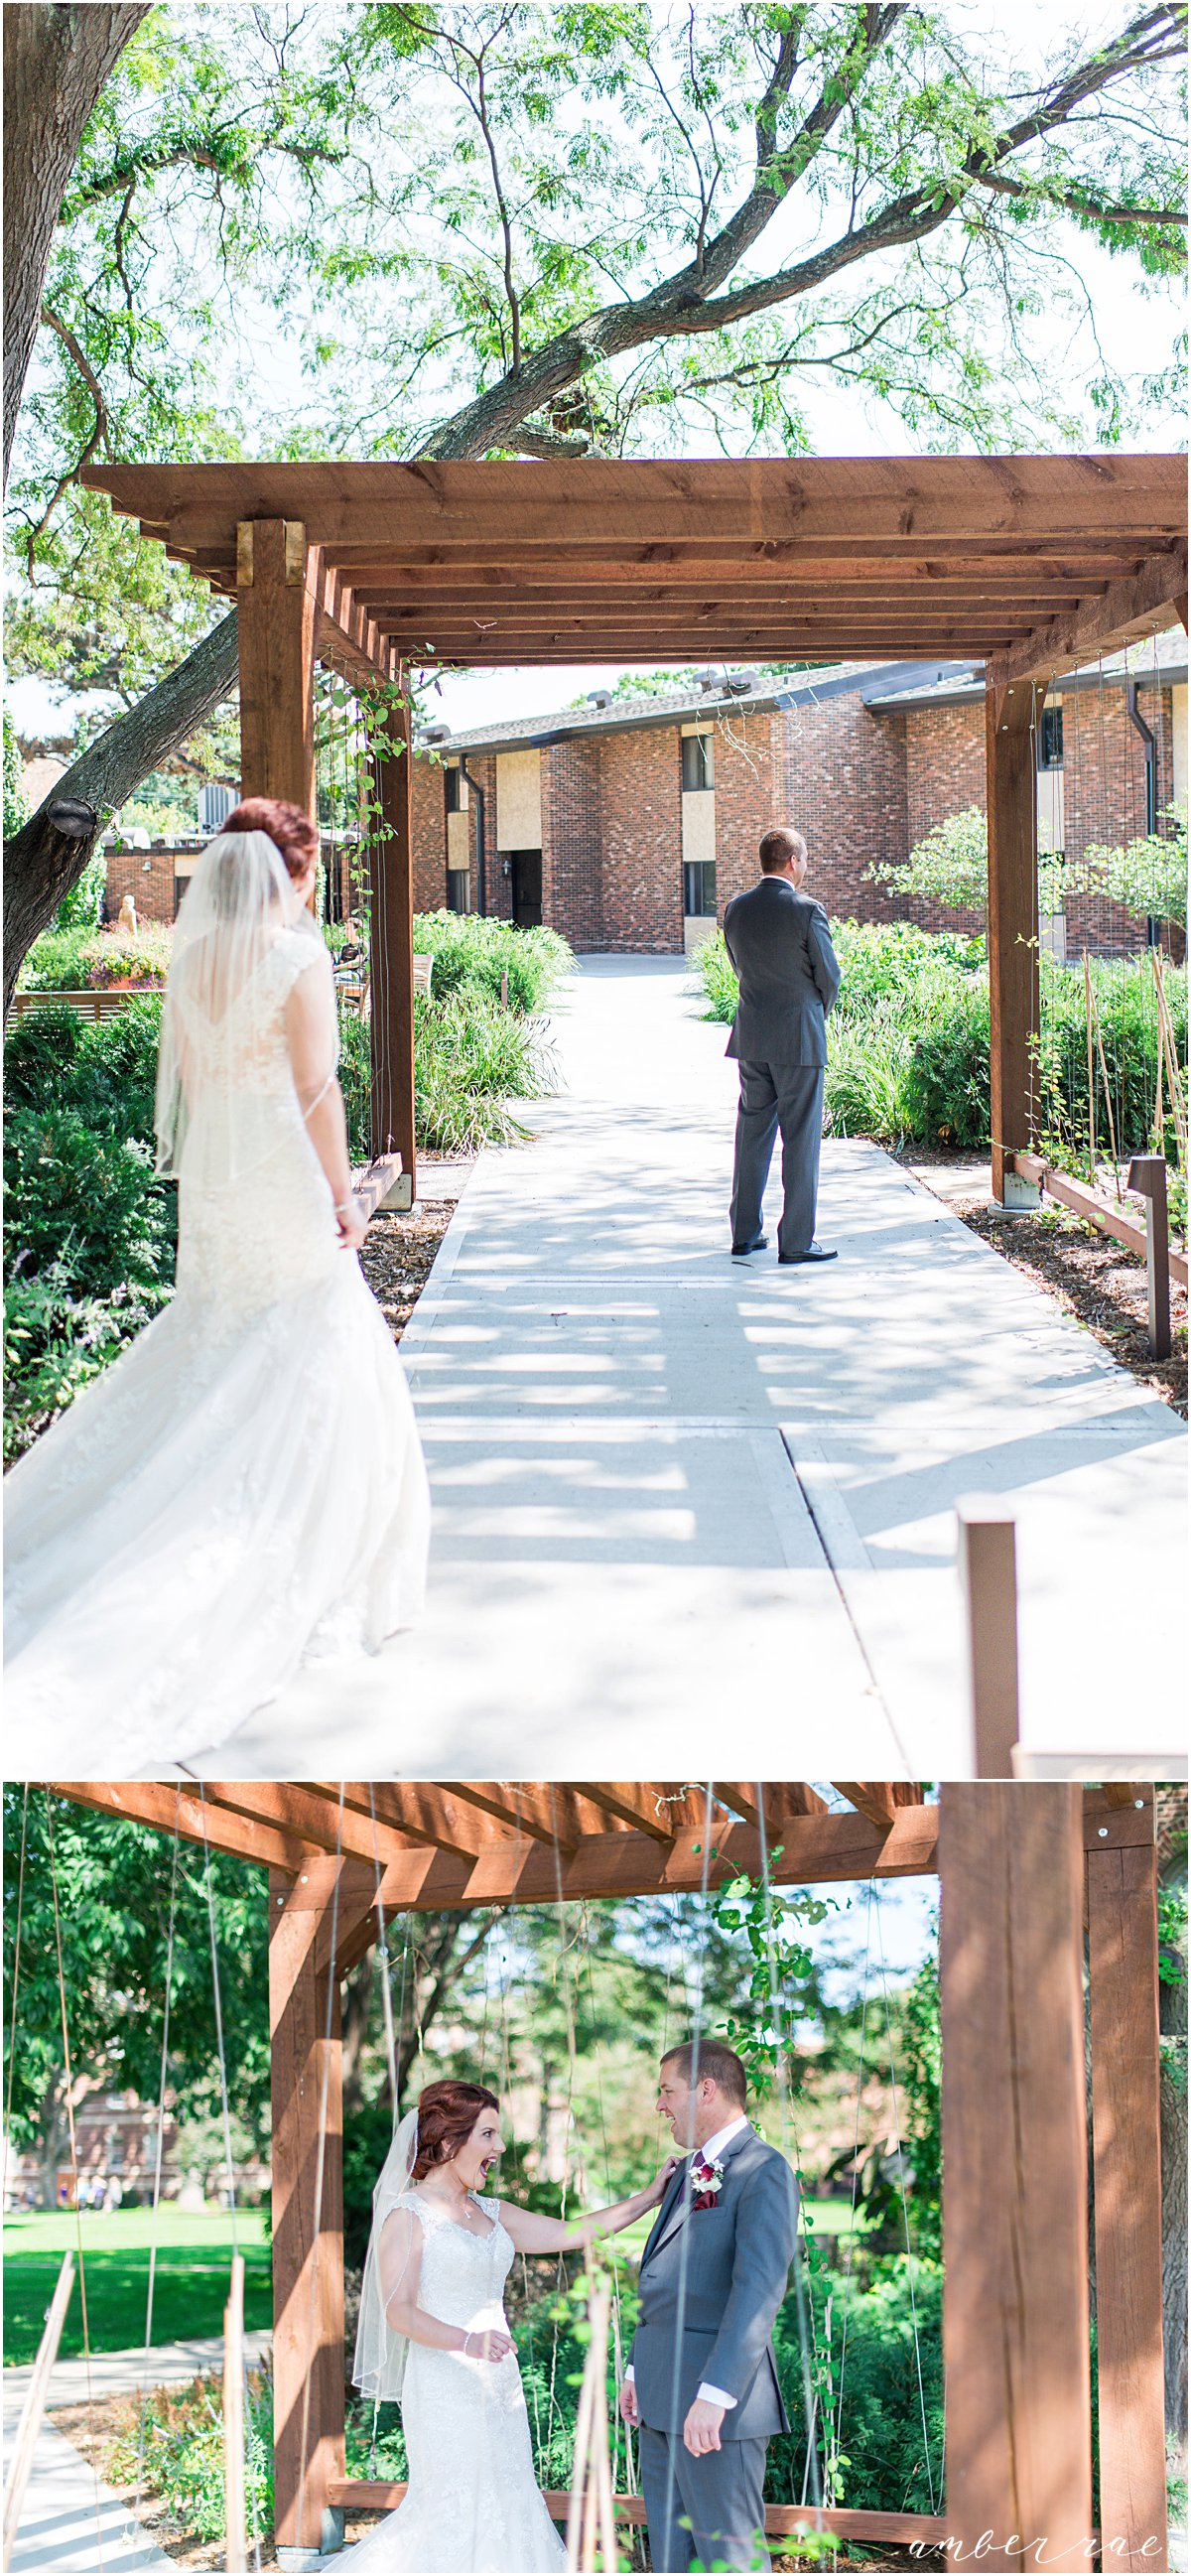 Gustafson Wedding 2018_0004.jpg